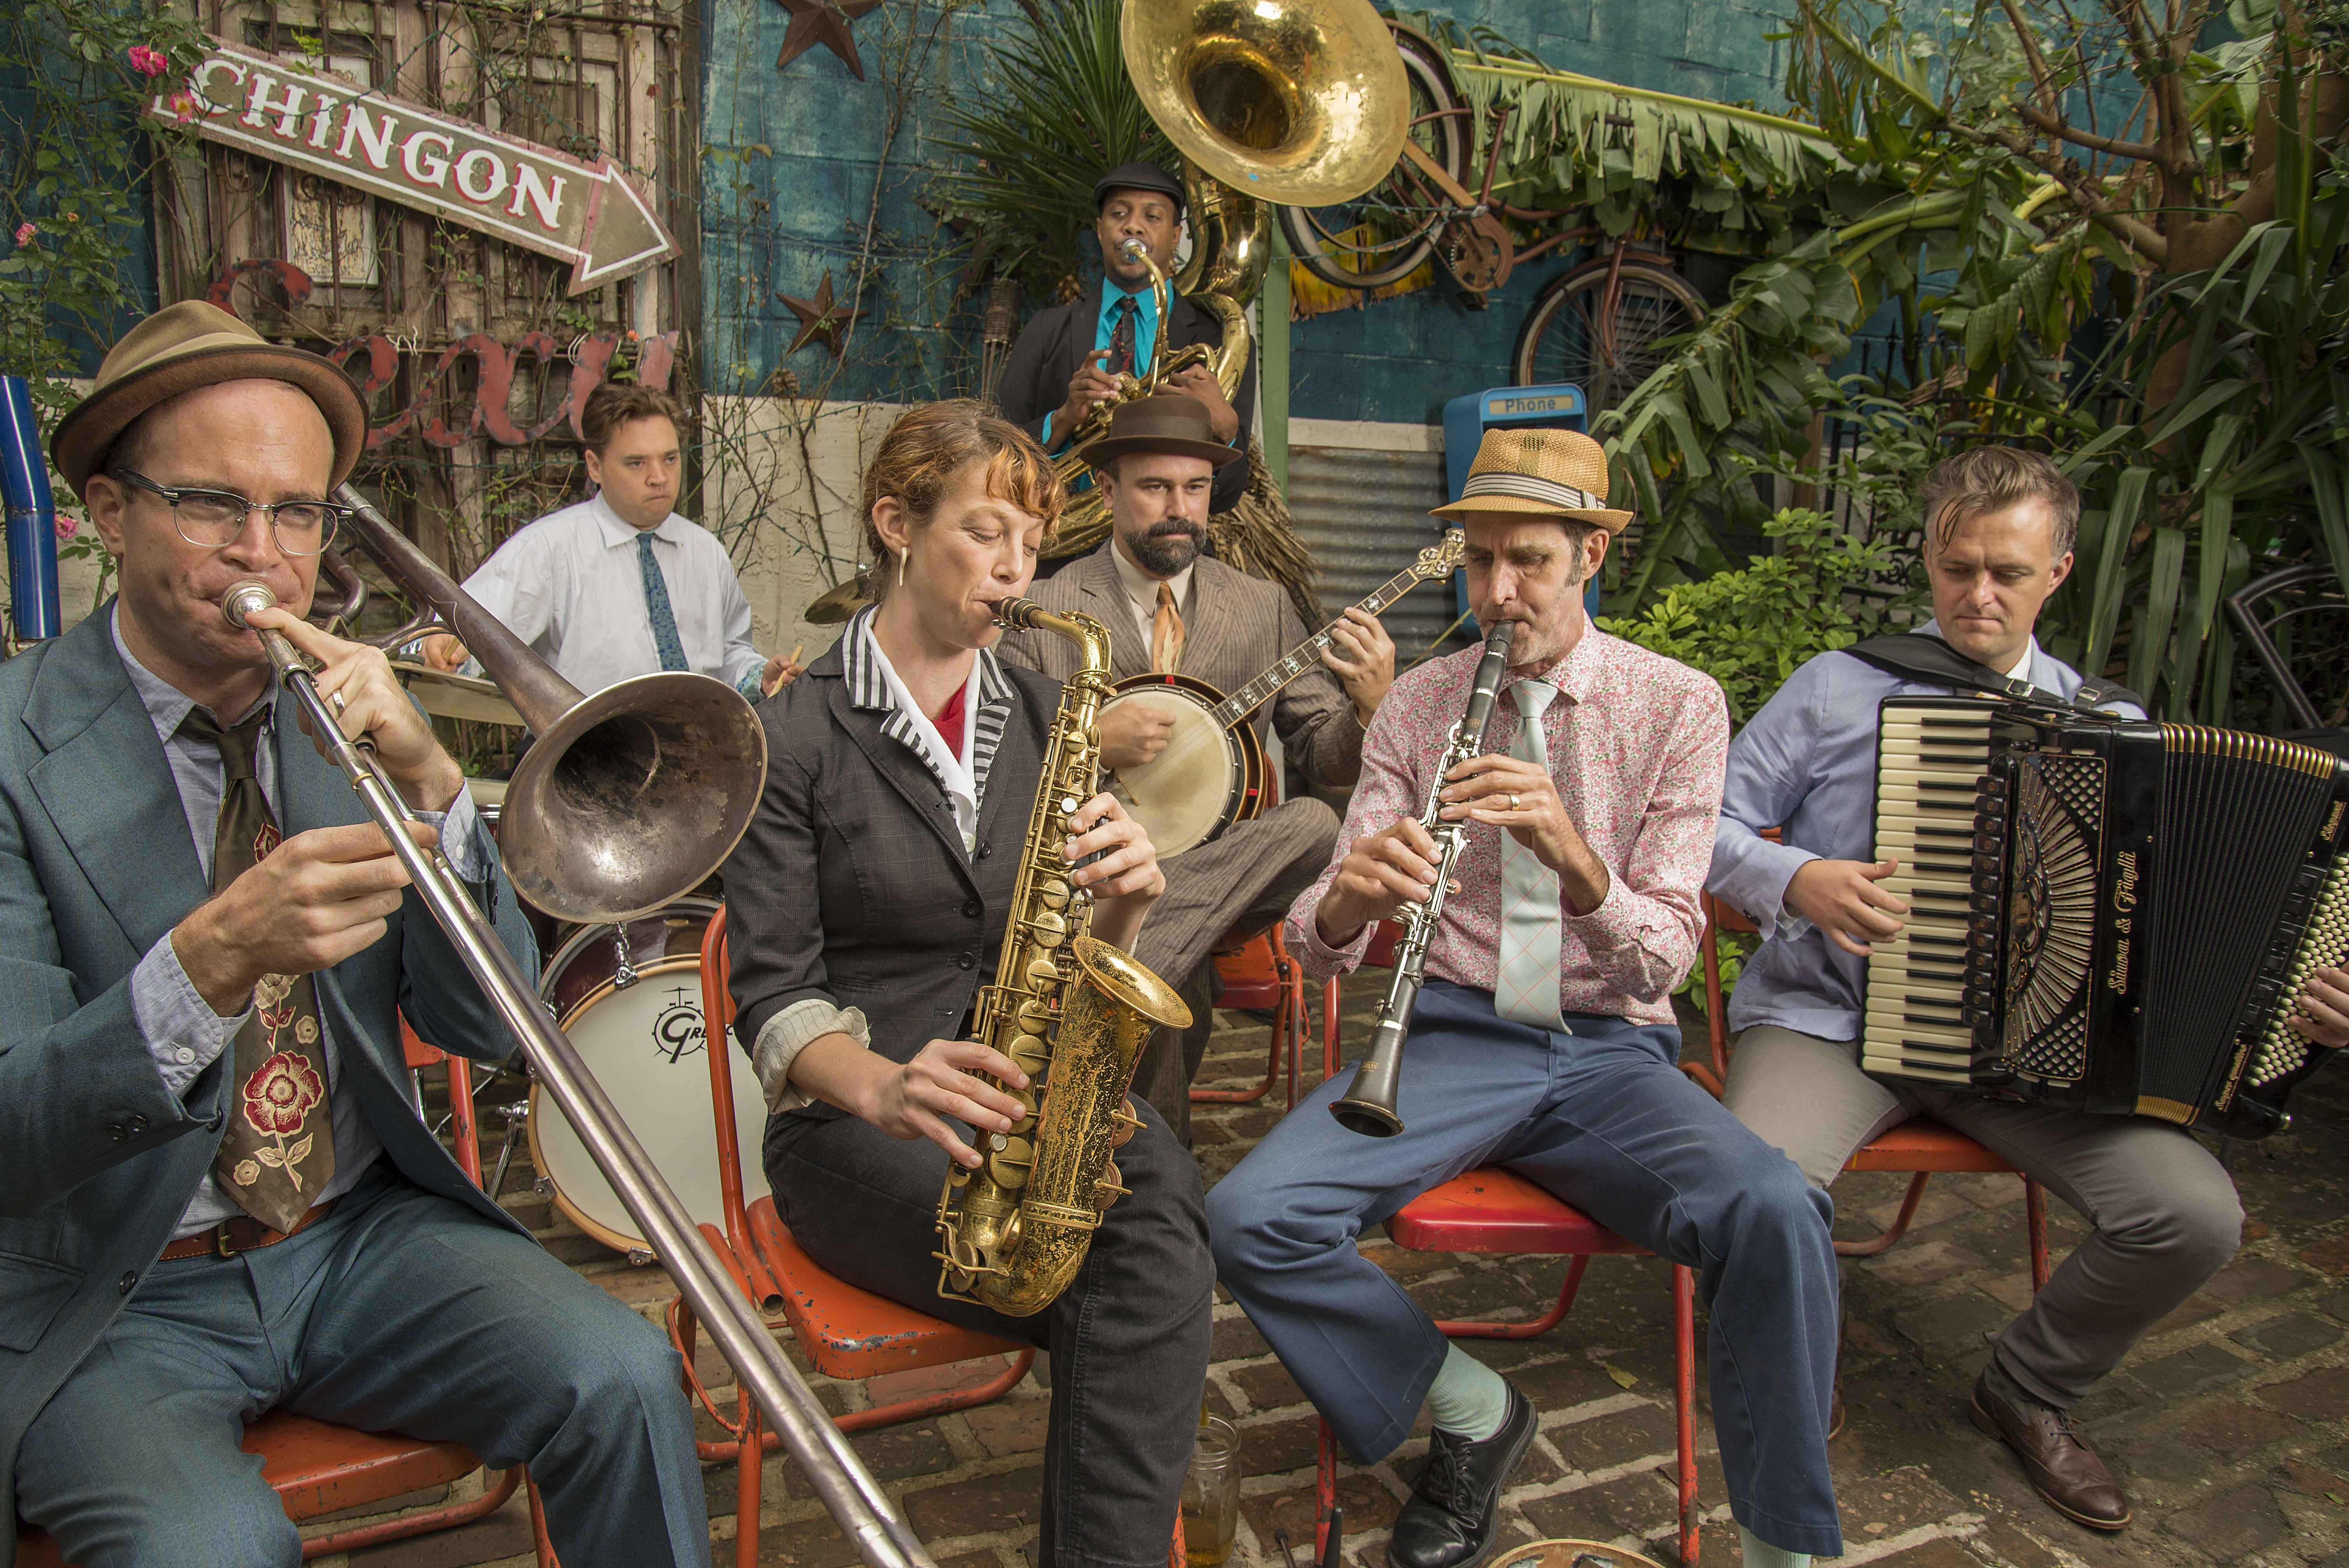 Panorama Jazz Band